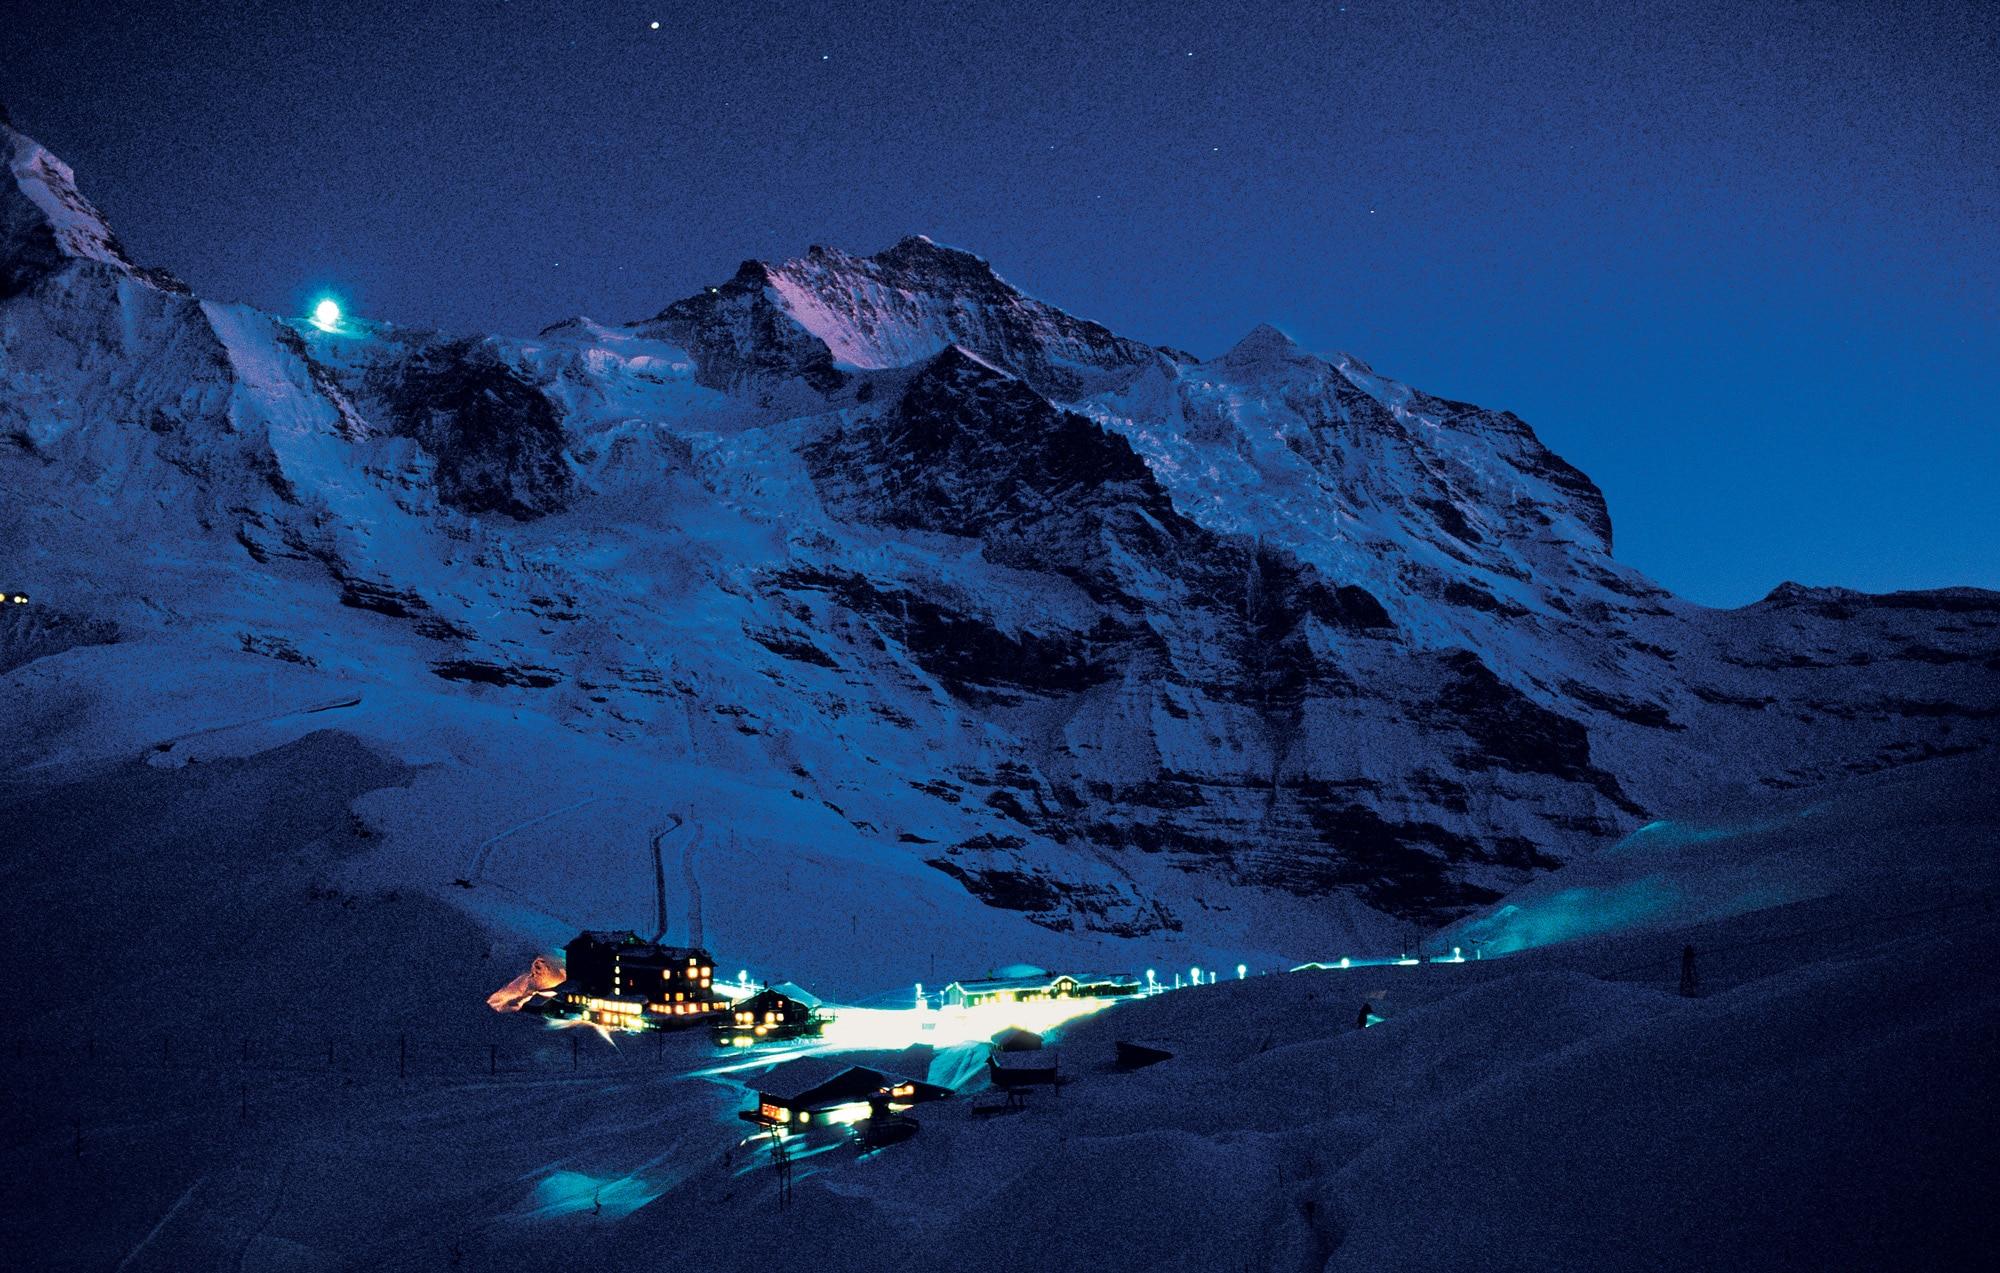 Eiger, Mönch e Jungfrau